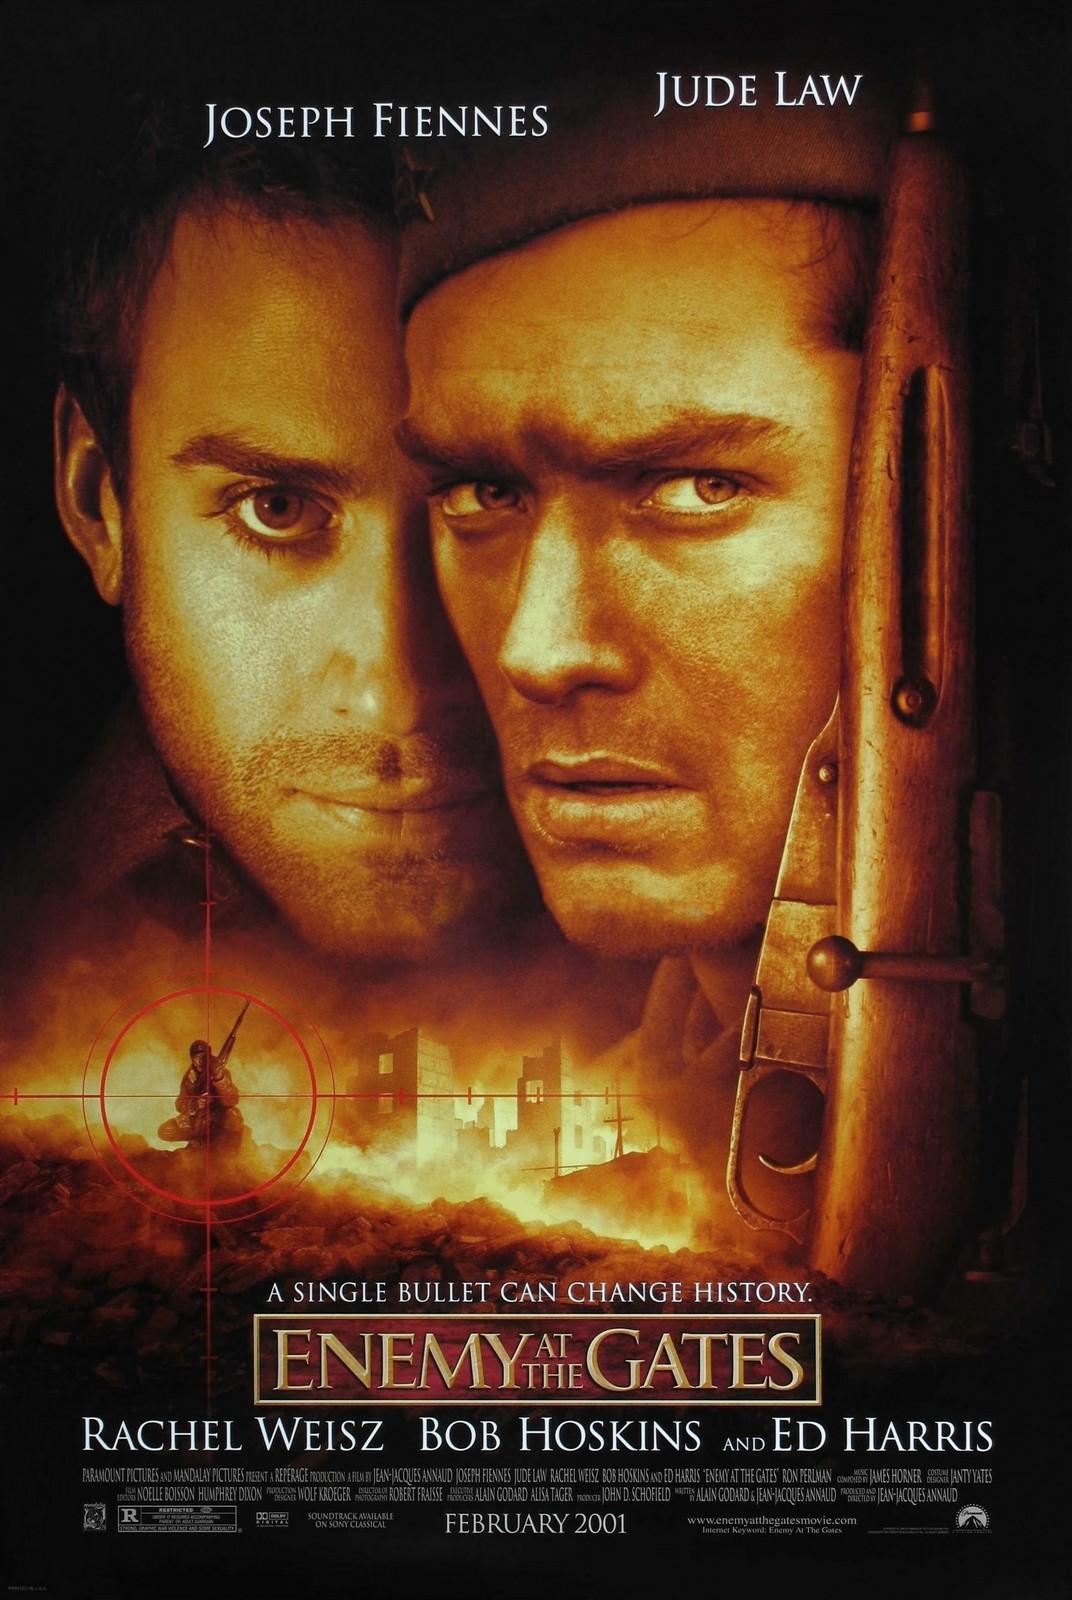 Movie, Enemy at the Gates(美國, 2001年) / 大敵當前(台灣) / 敵對邊緣(香港) / 决战中的较量(中國), 電影海報, 美國